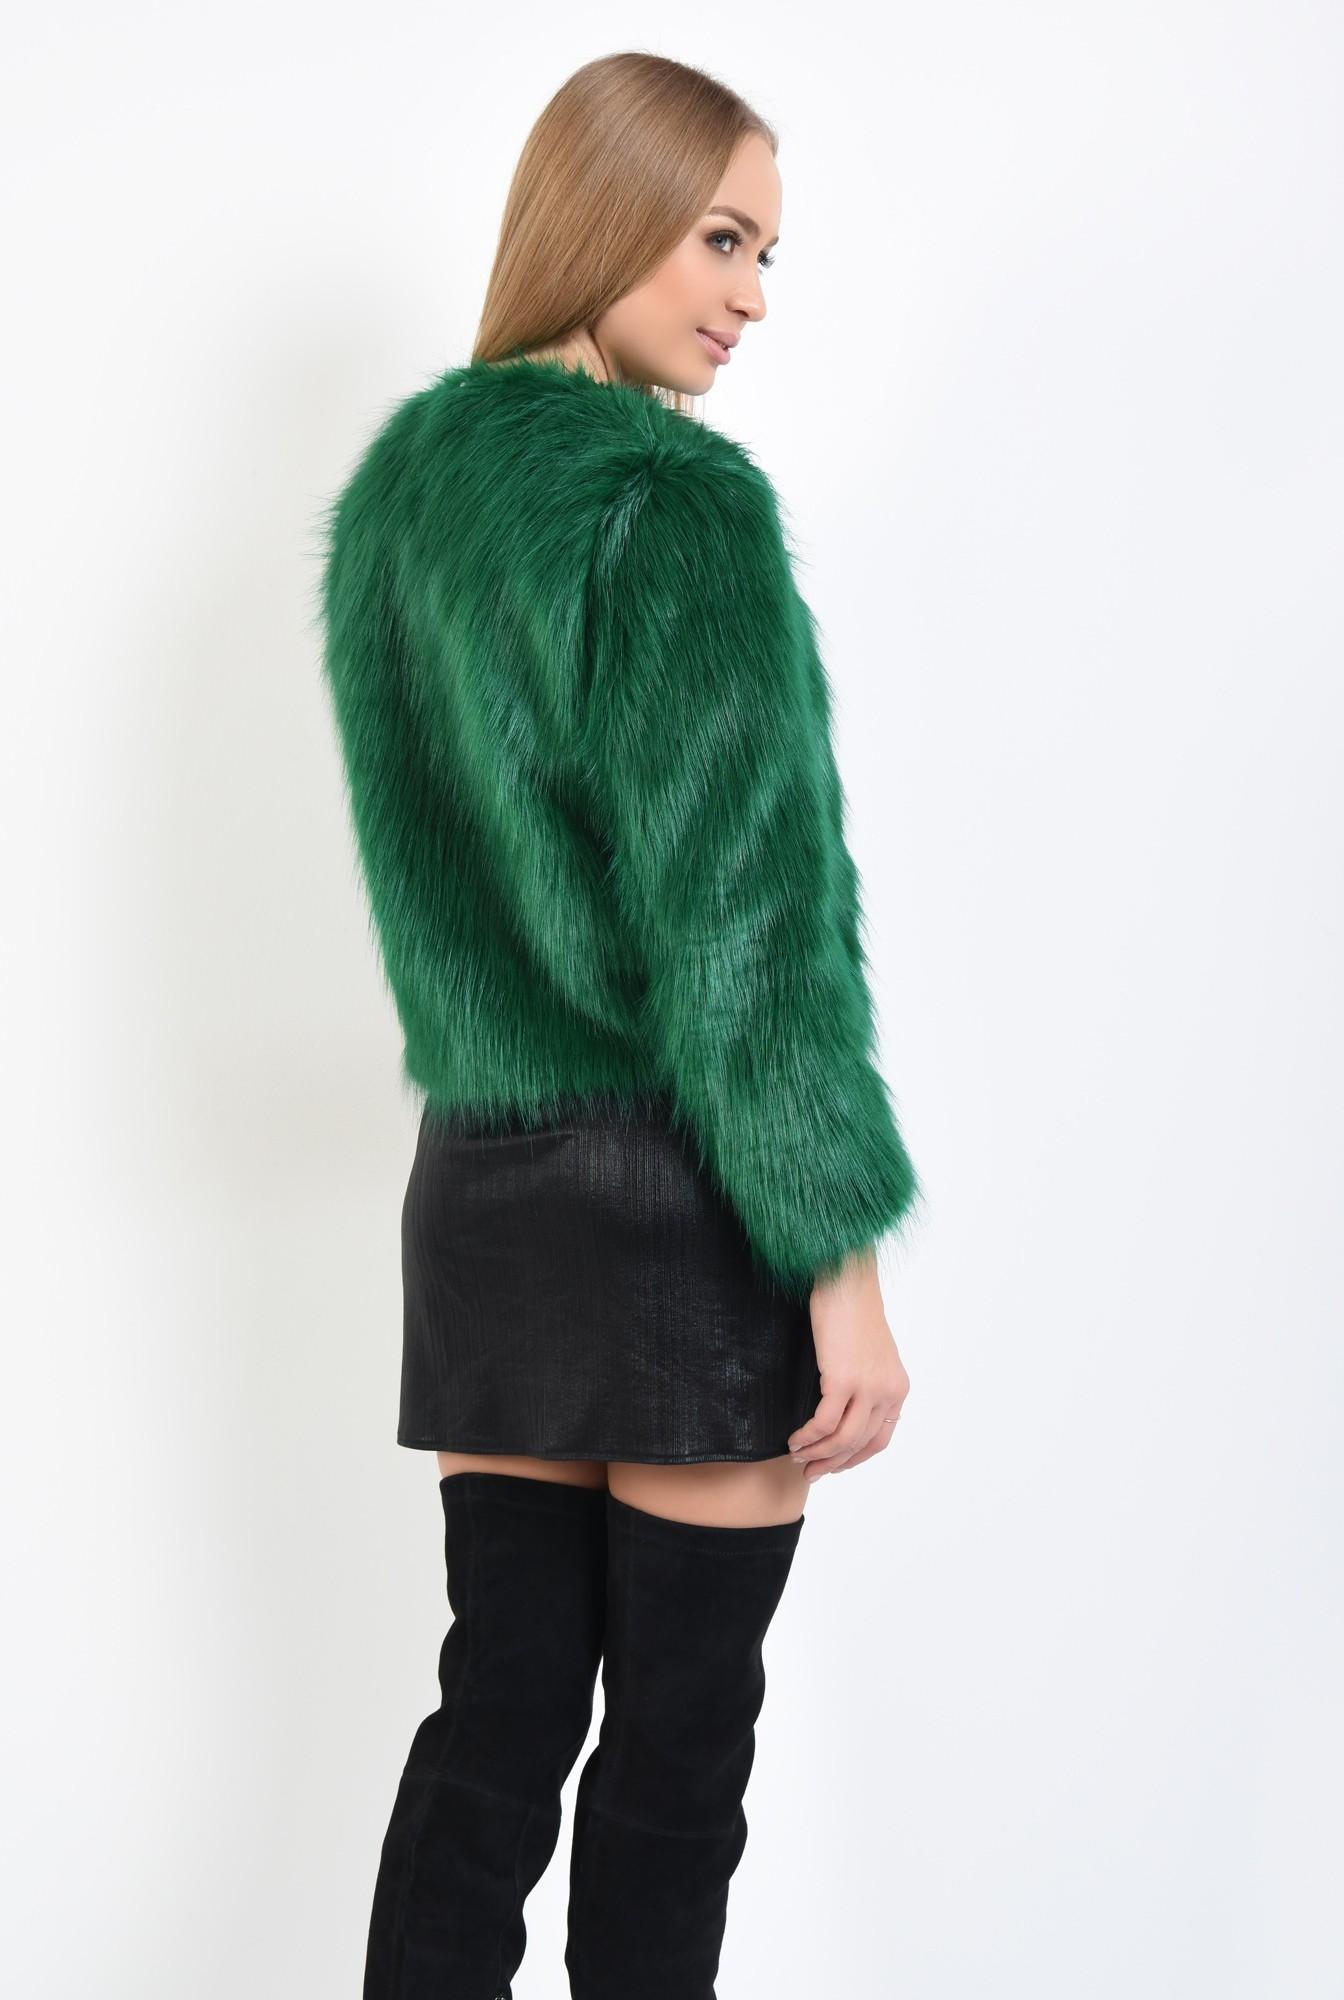 1 - jacheta verde, blana artificiala, maneci lungi